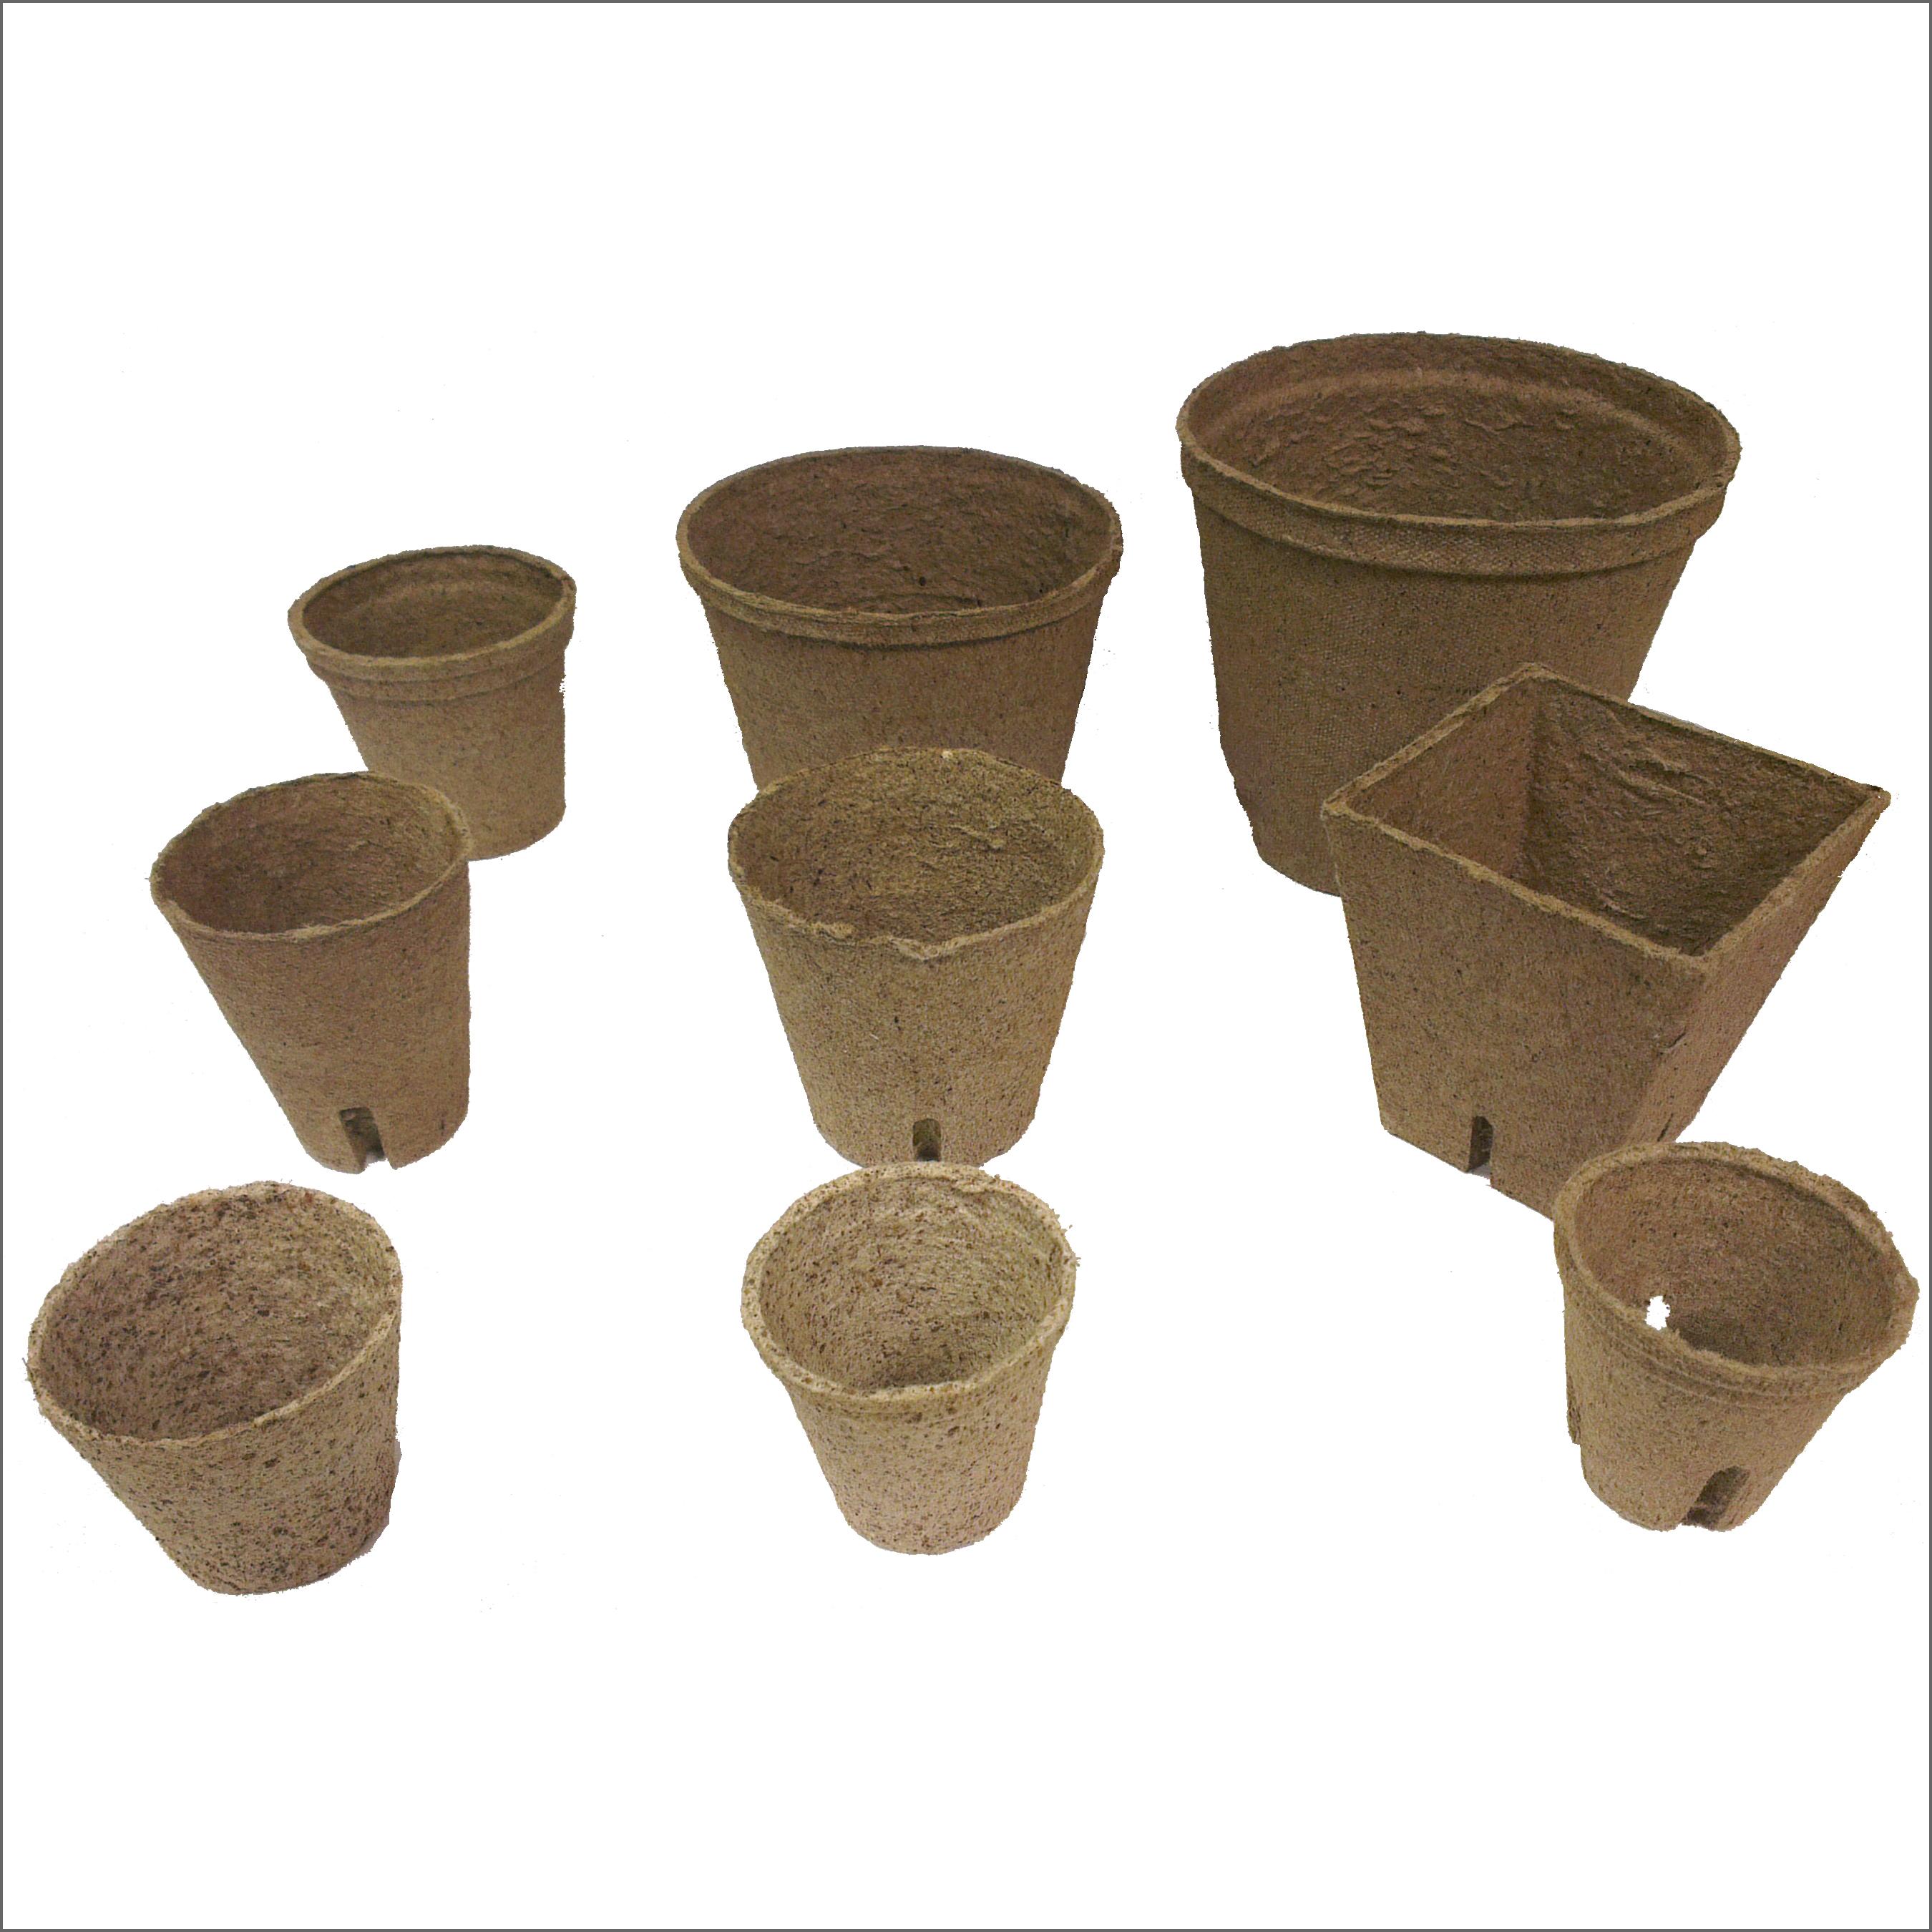 Jiffy Peat Pellets Pots Organic Seed Flower Biodegradable